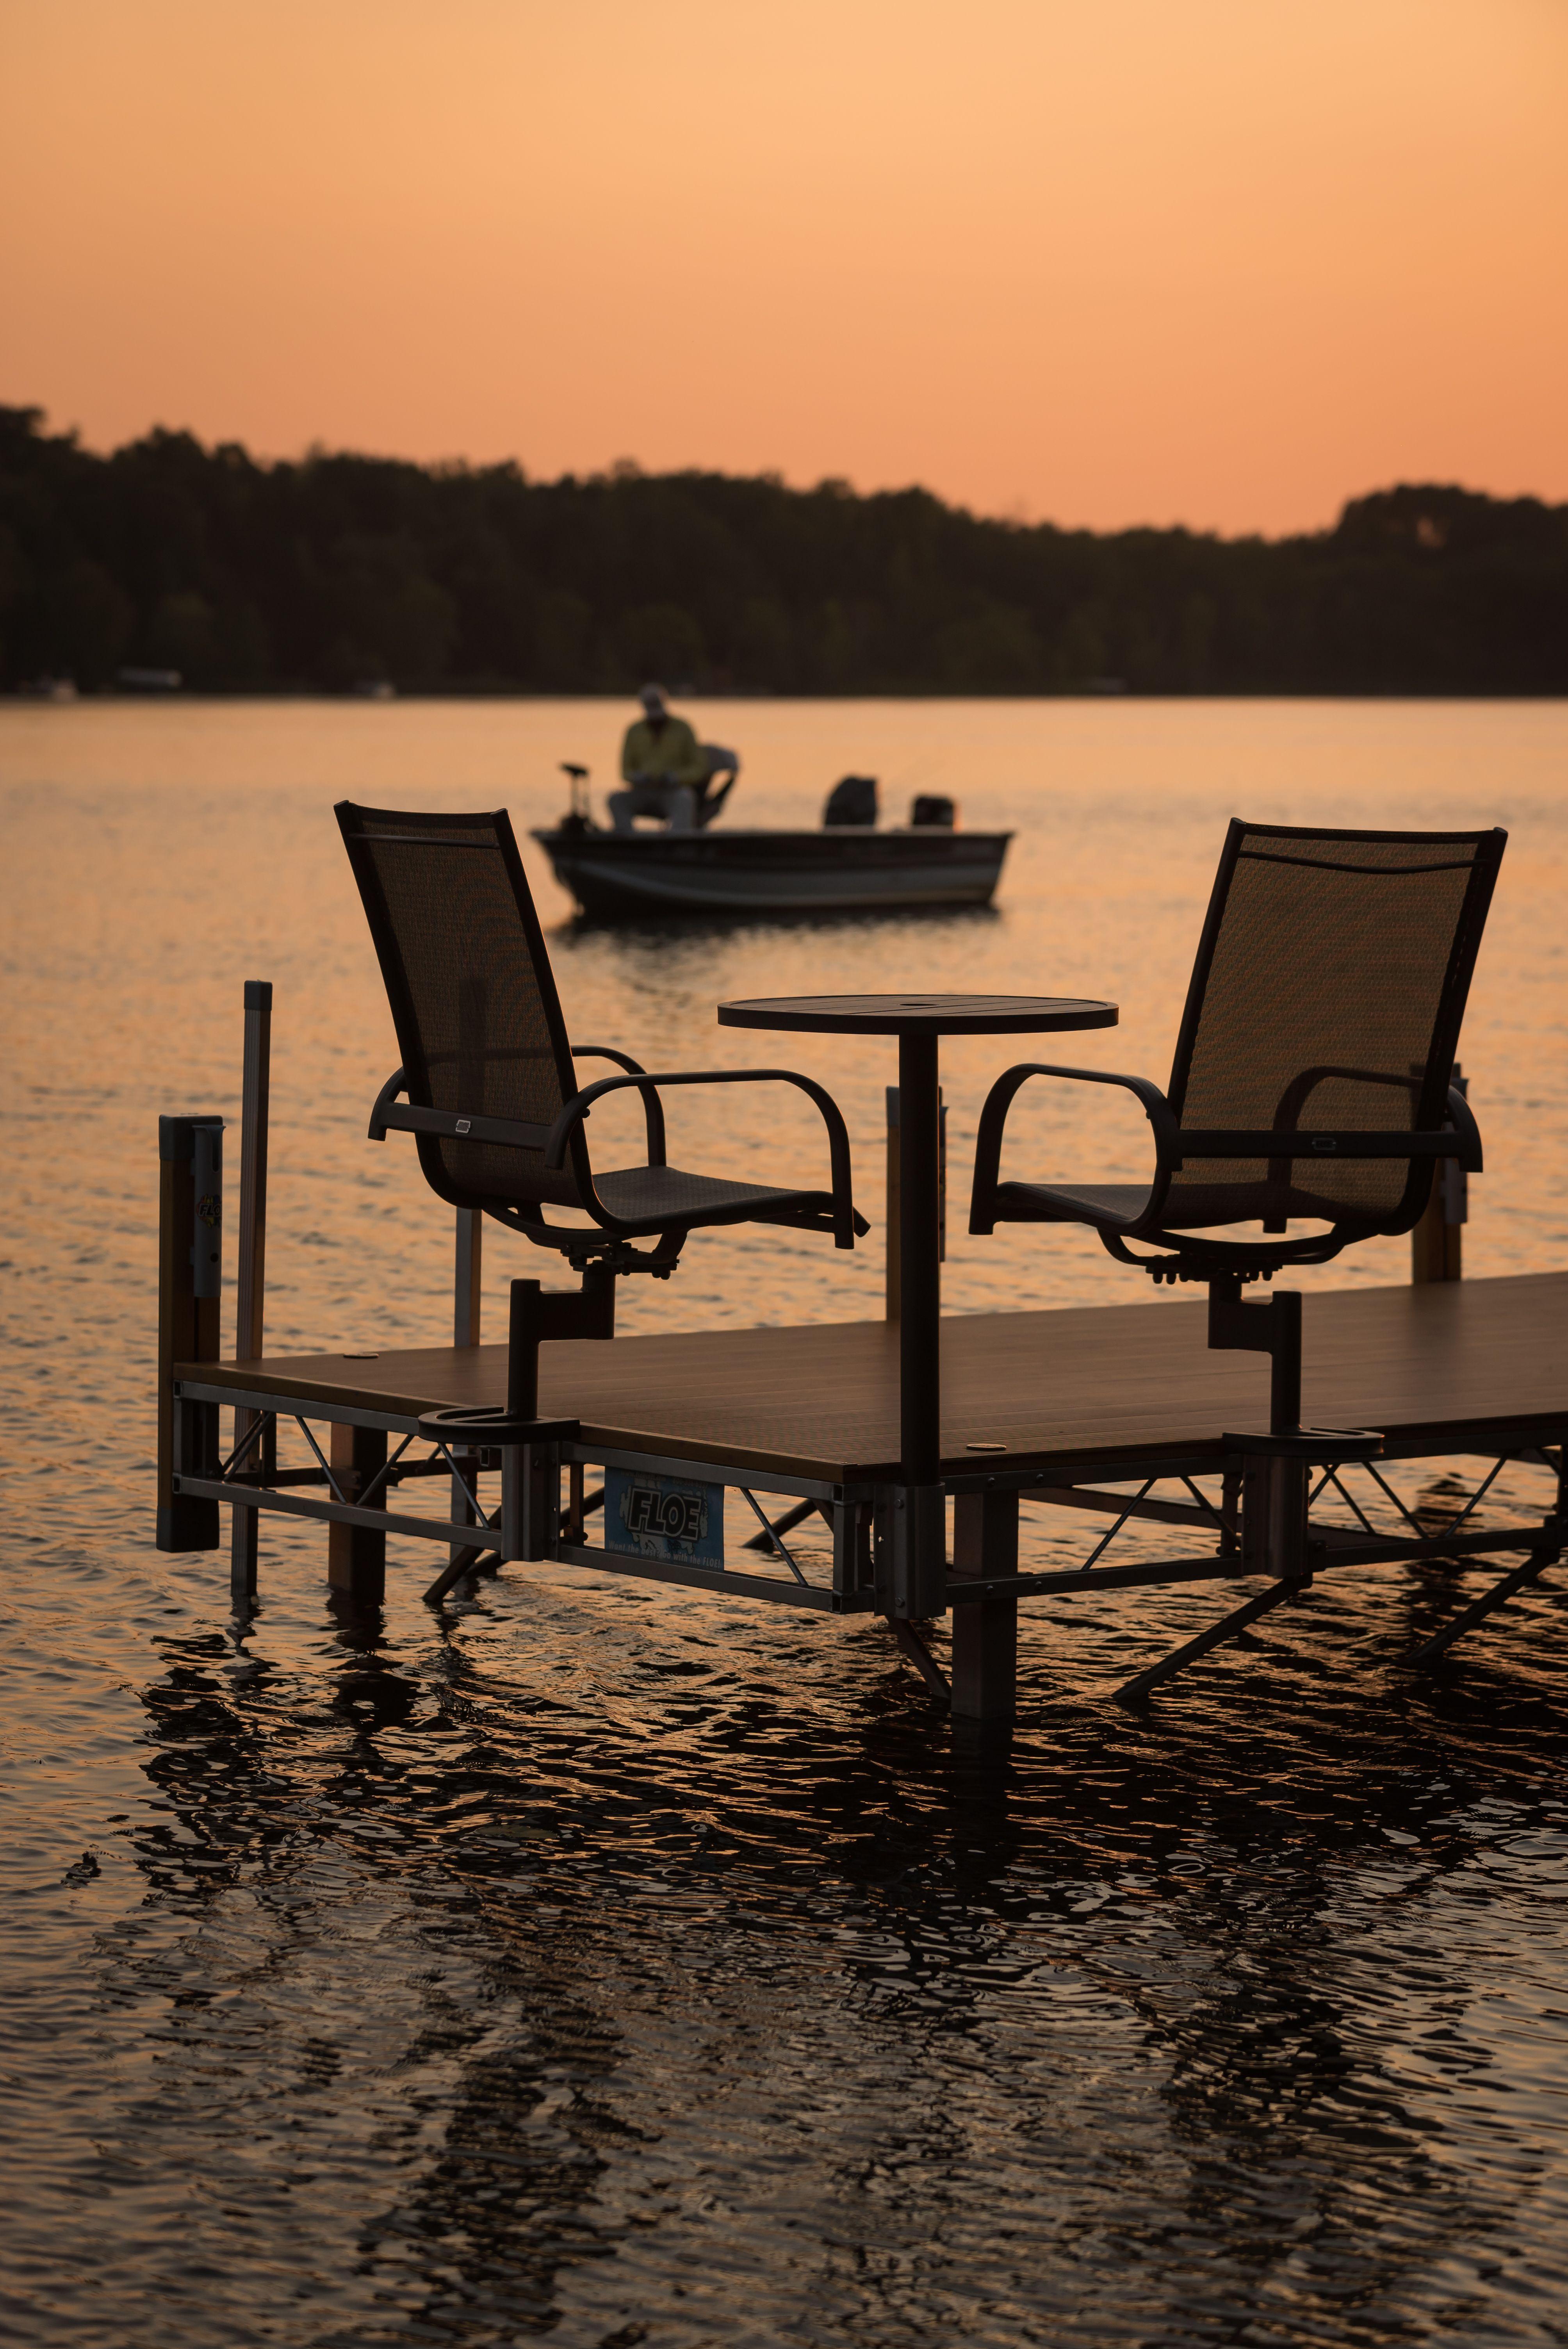 Maintanence Free Dock Furniture Floe Lake Dock Dock Furniture Boat Lift Dock